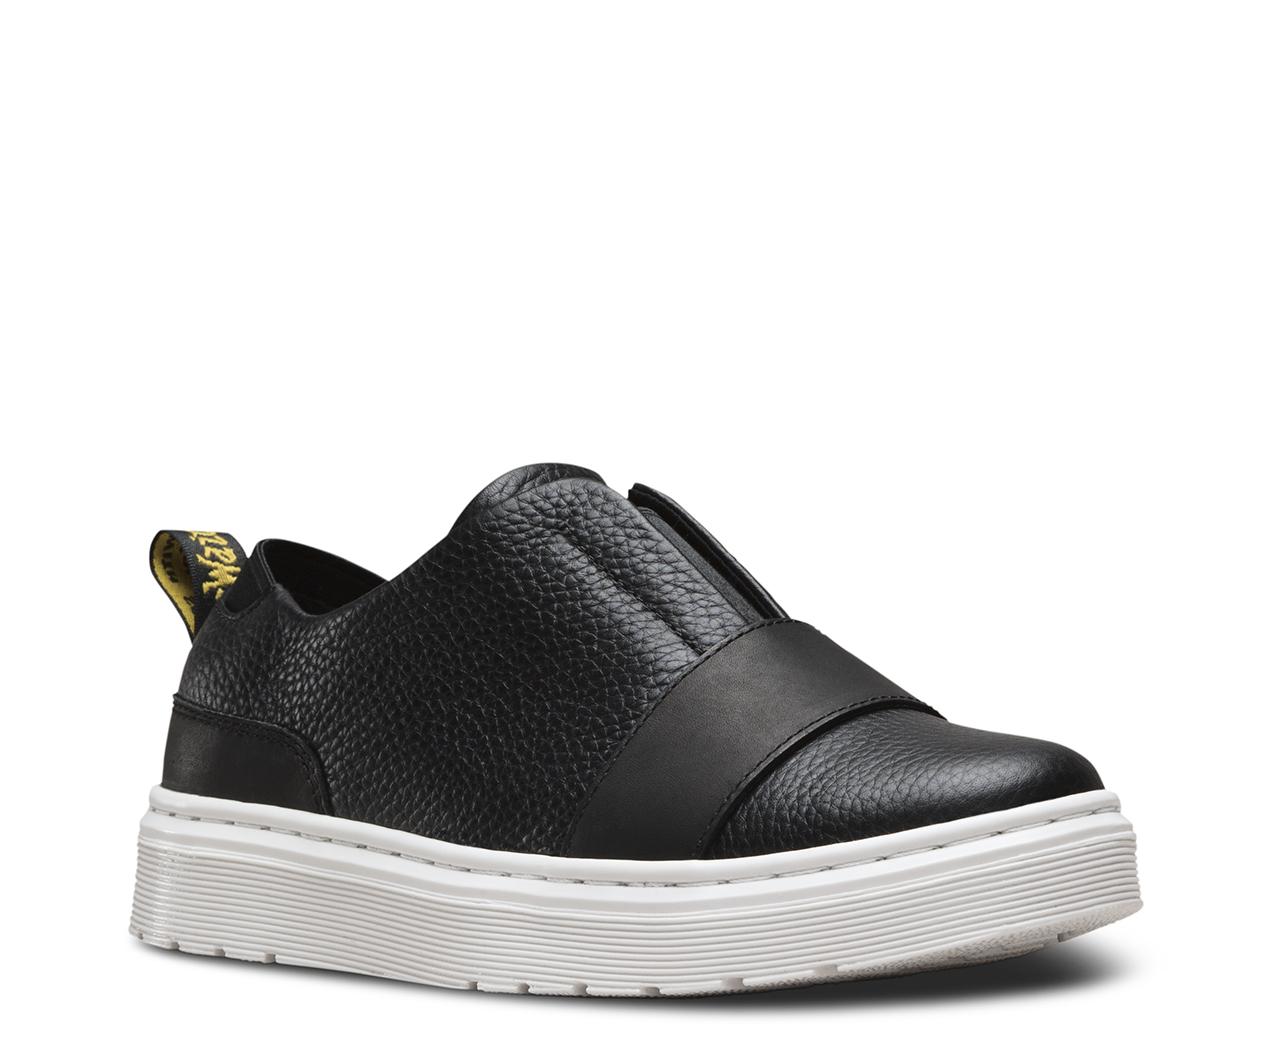 lylah temperley women 39 s boots shoes official dr martens store. Black Bedroom Furniture Sets. Home Design Ideas